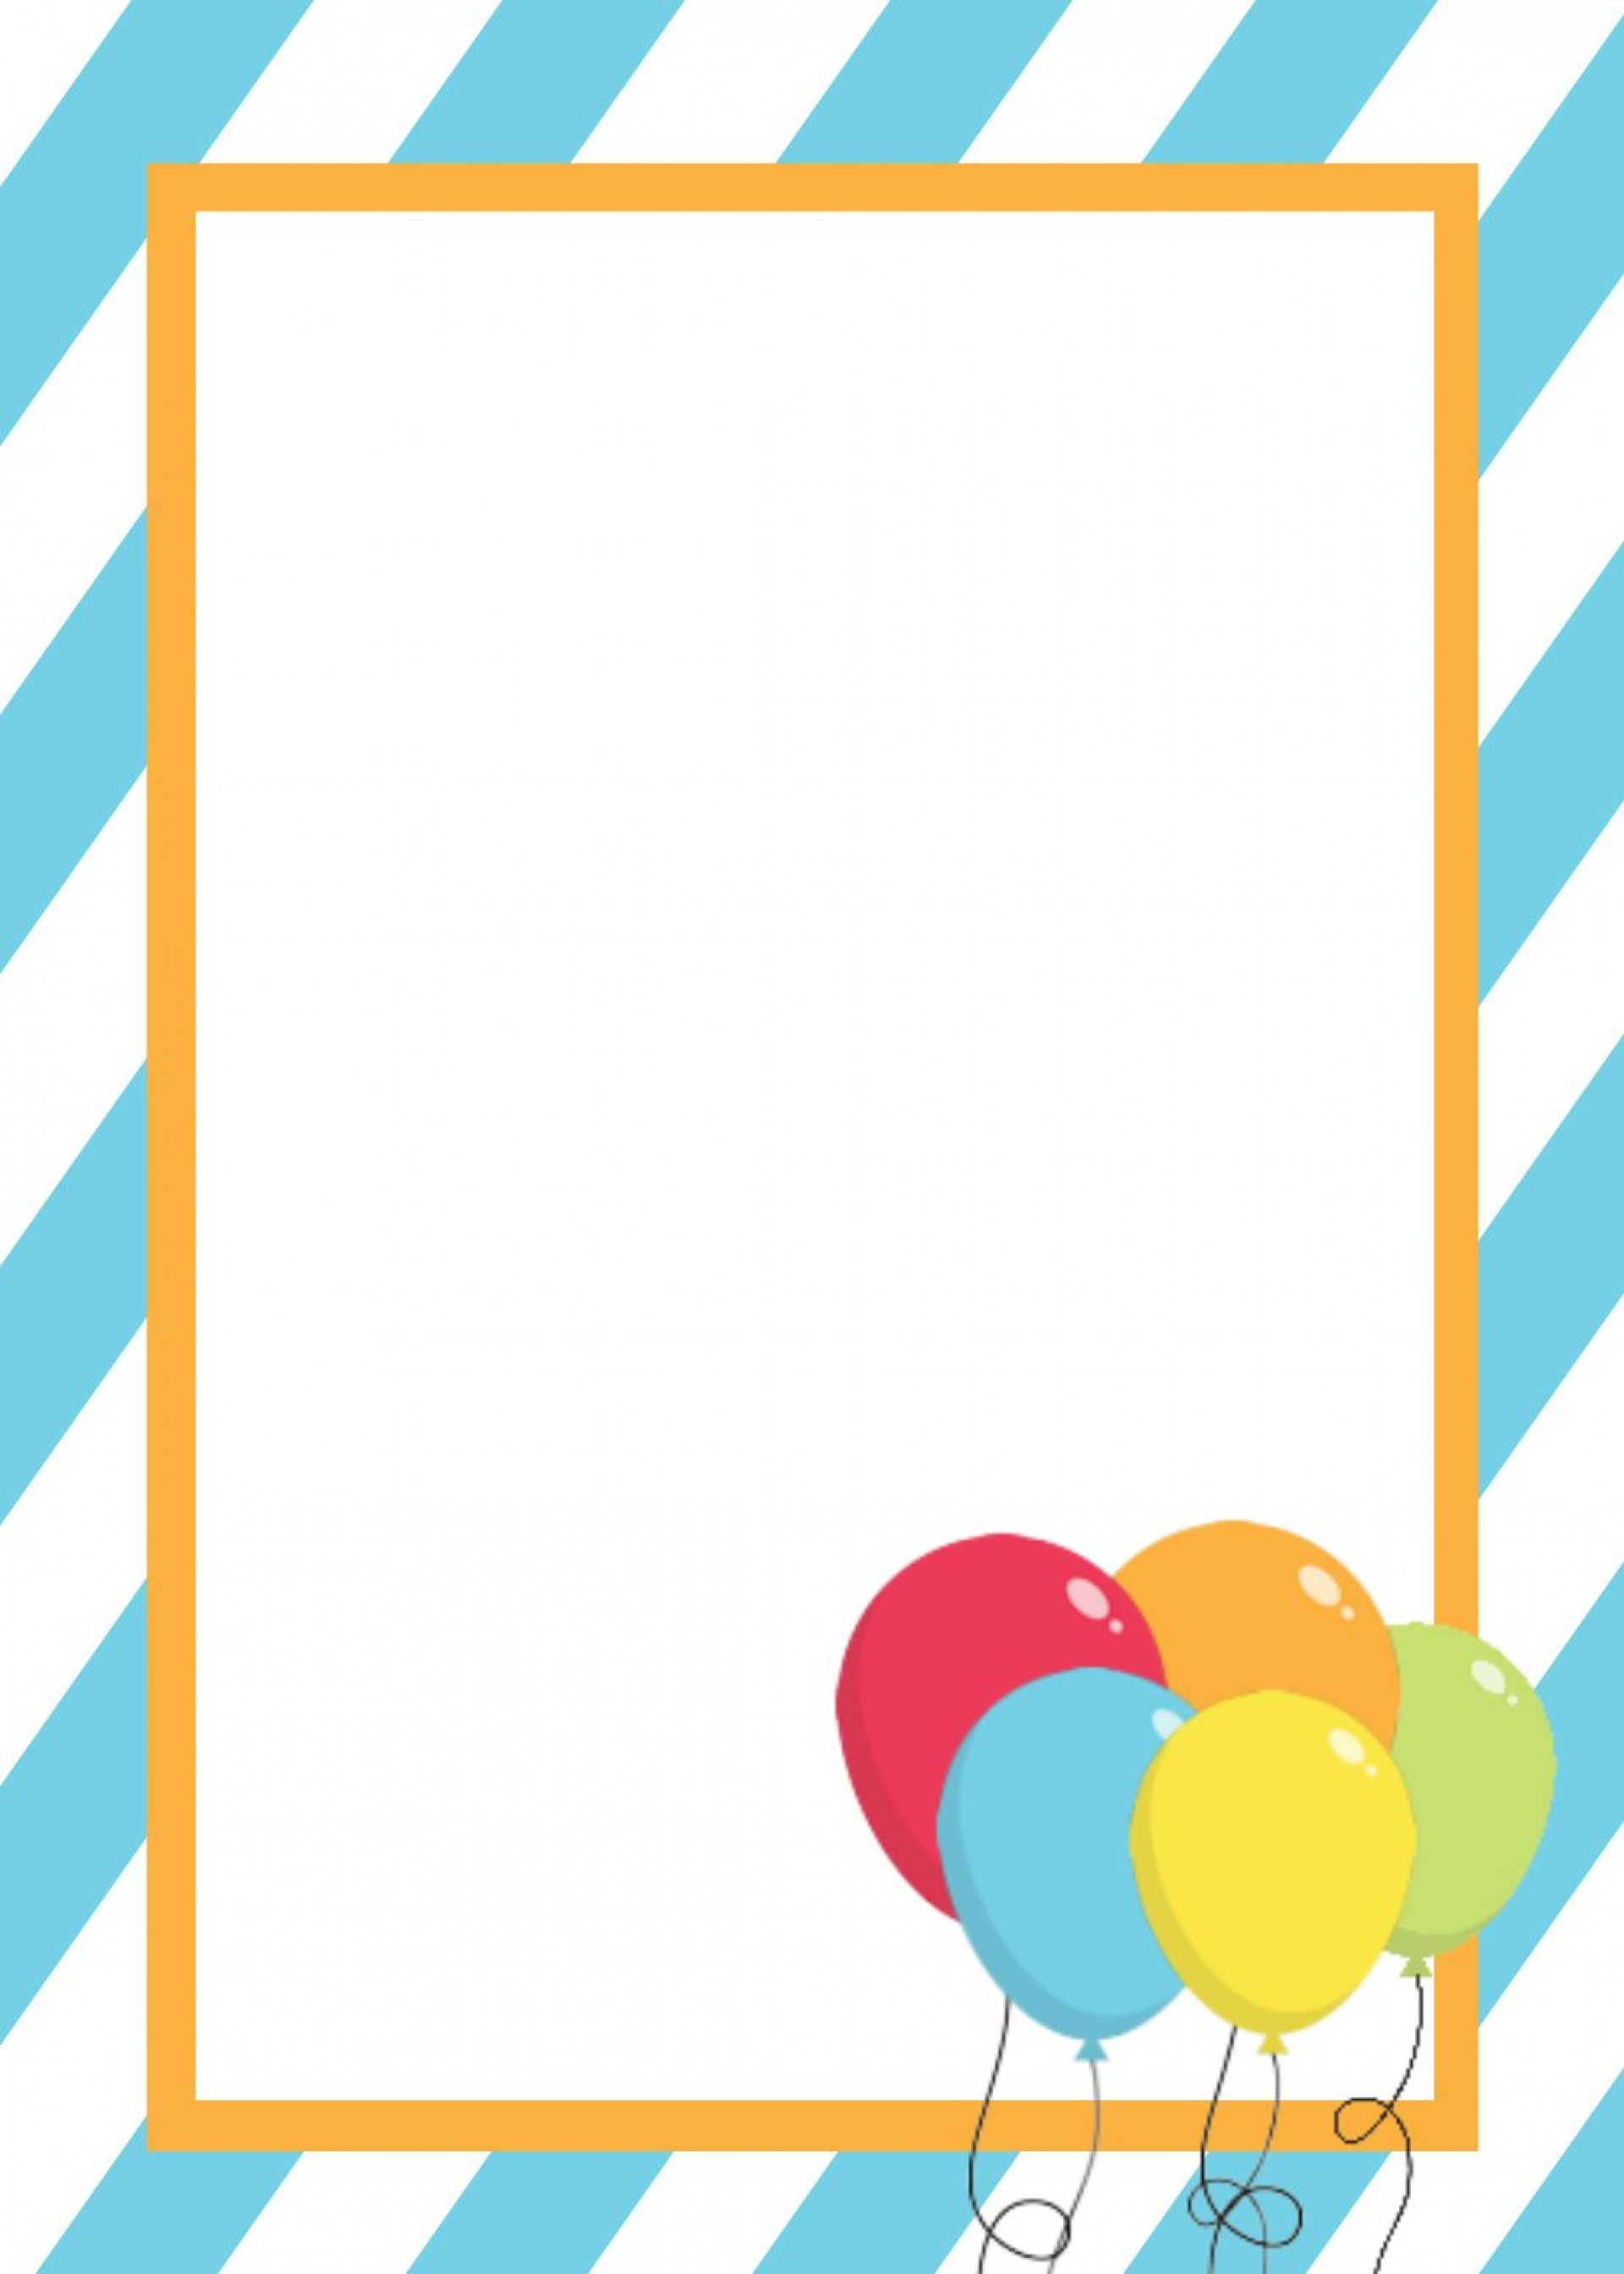 012 Dreaded Party Invite Template Word Idea  Holiday Invitation Wording Sample Retirement Free Editable1920